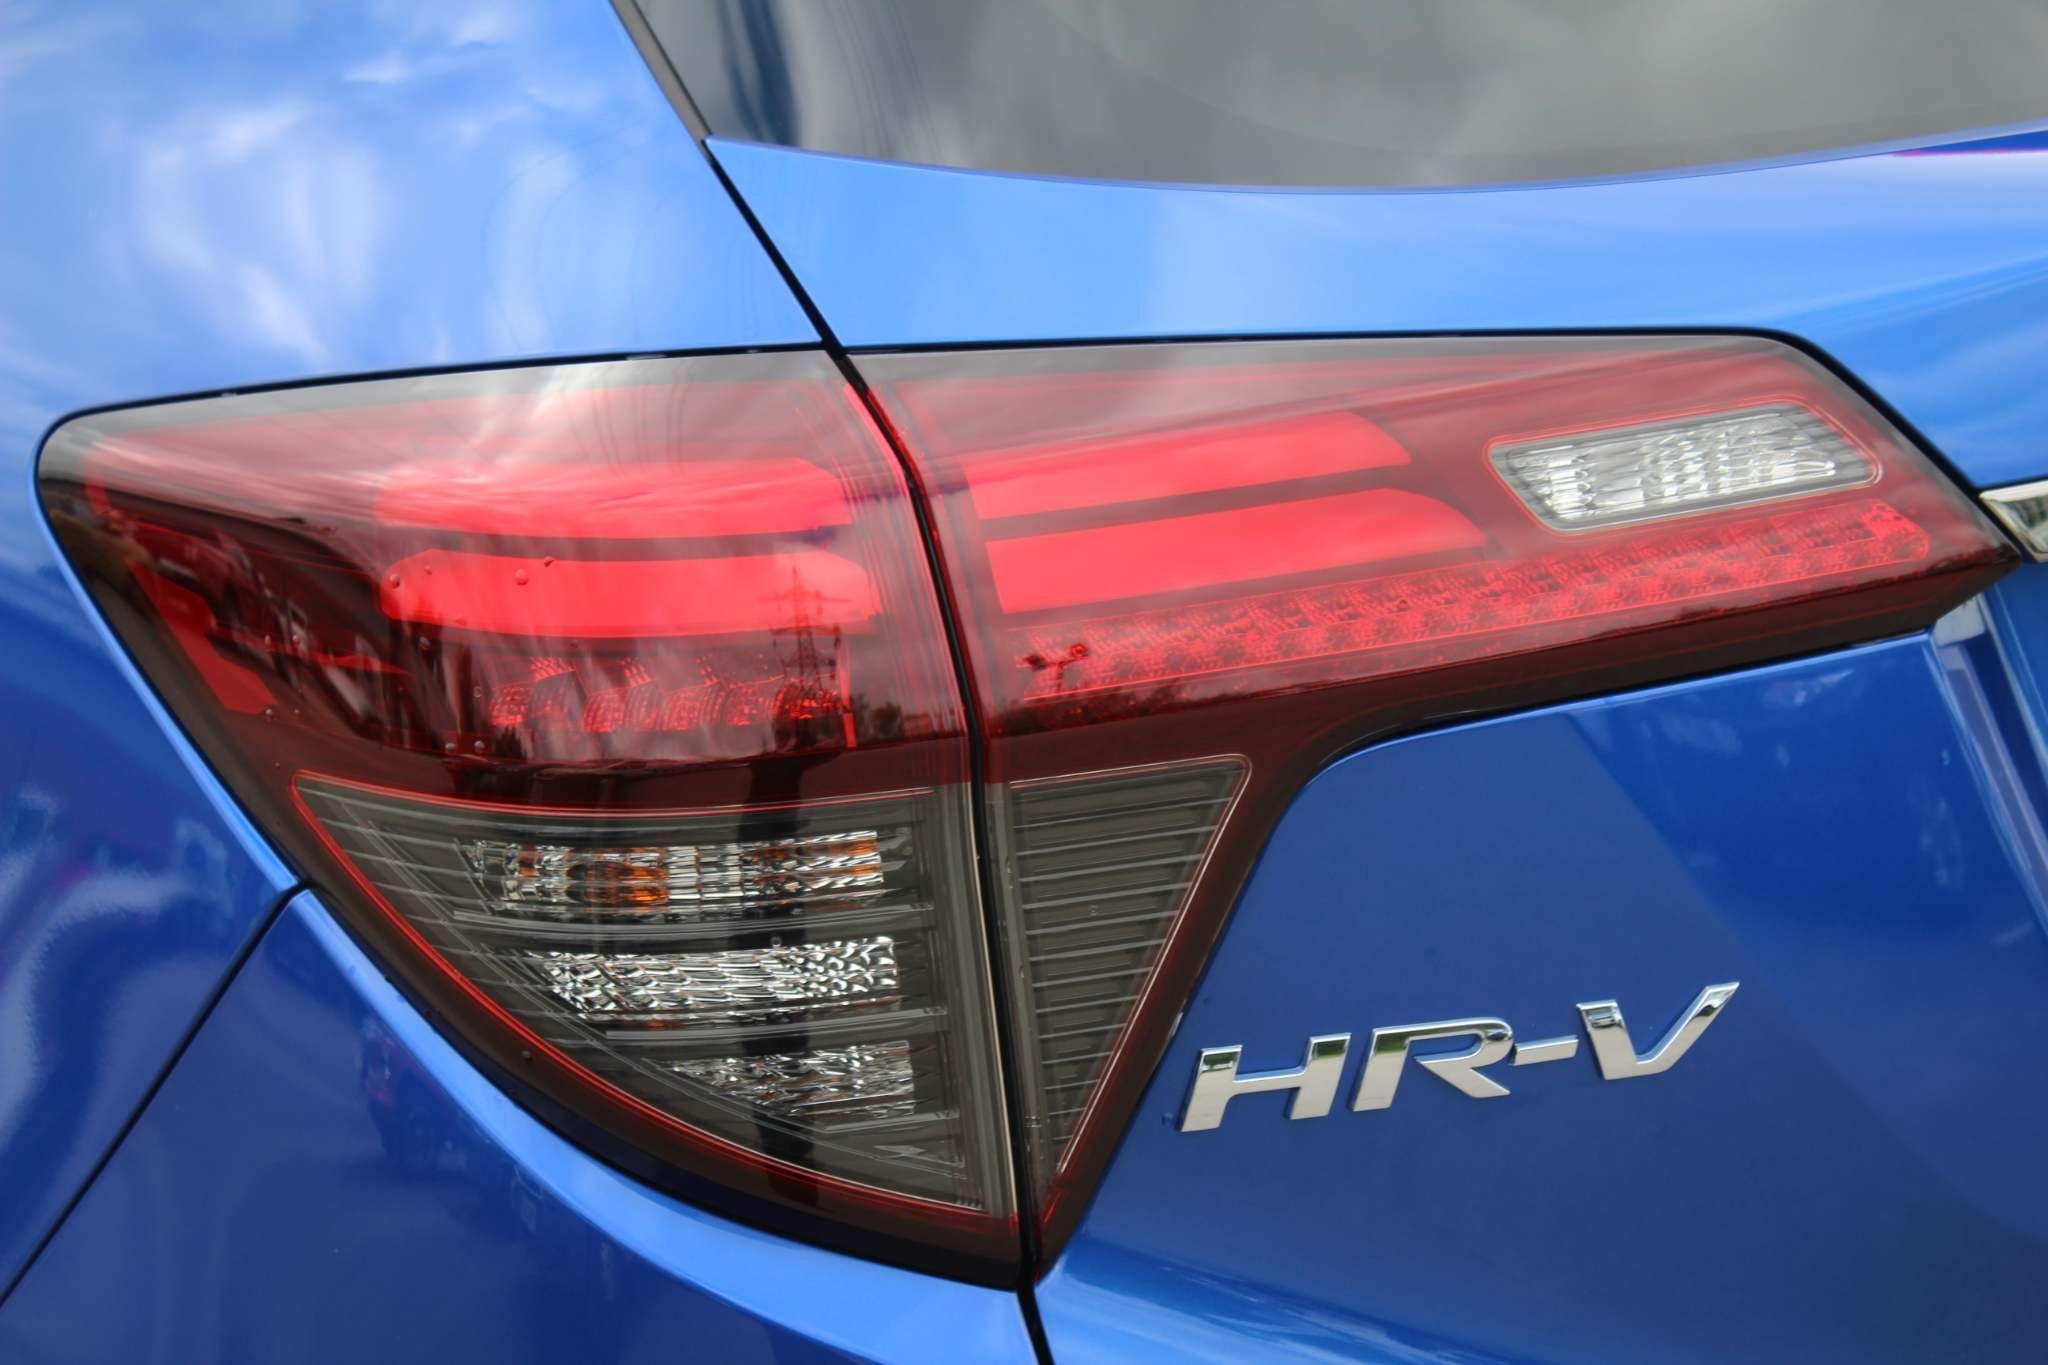 Honda HR-V Images